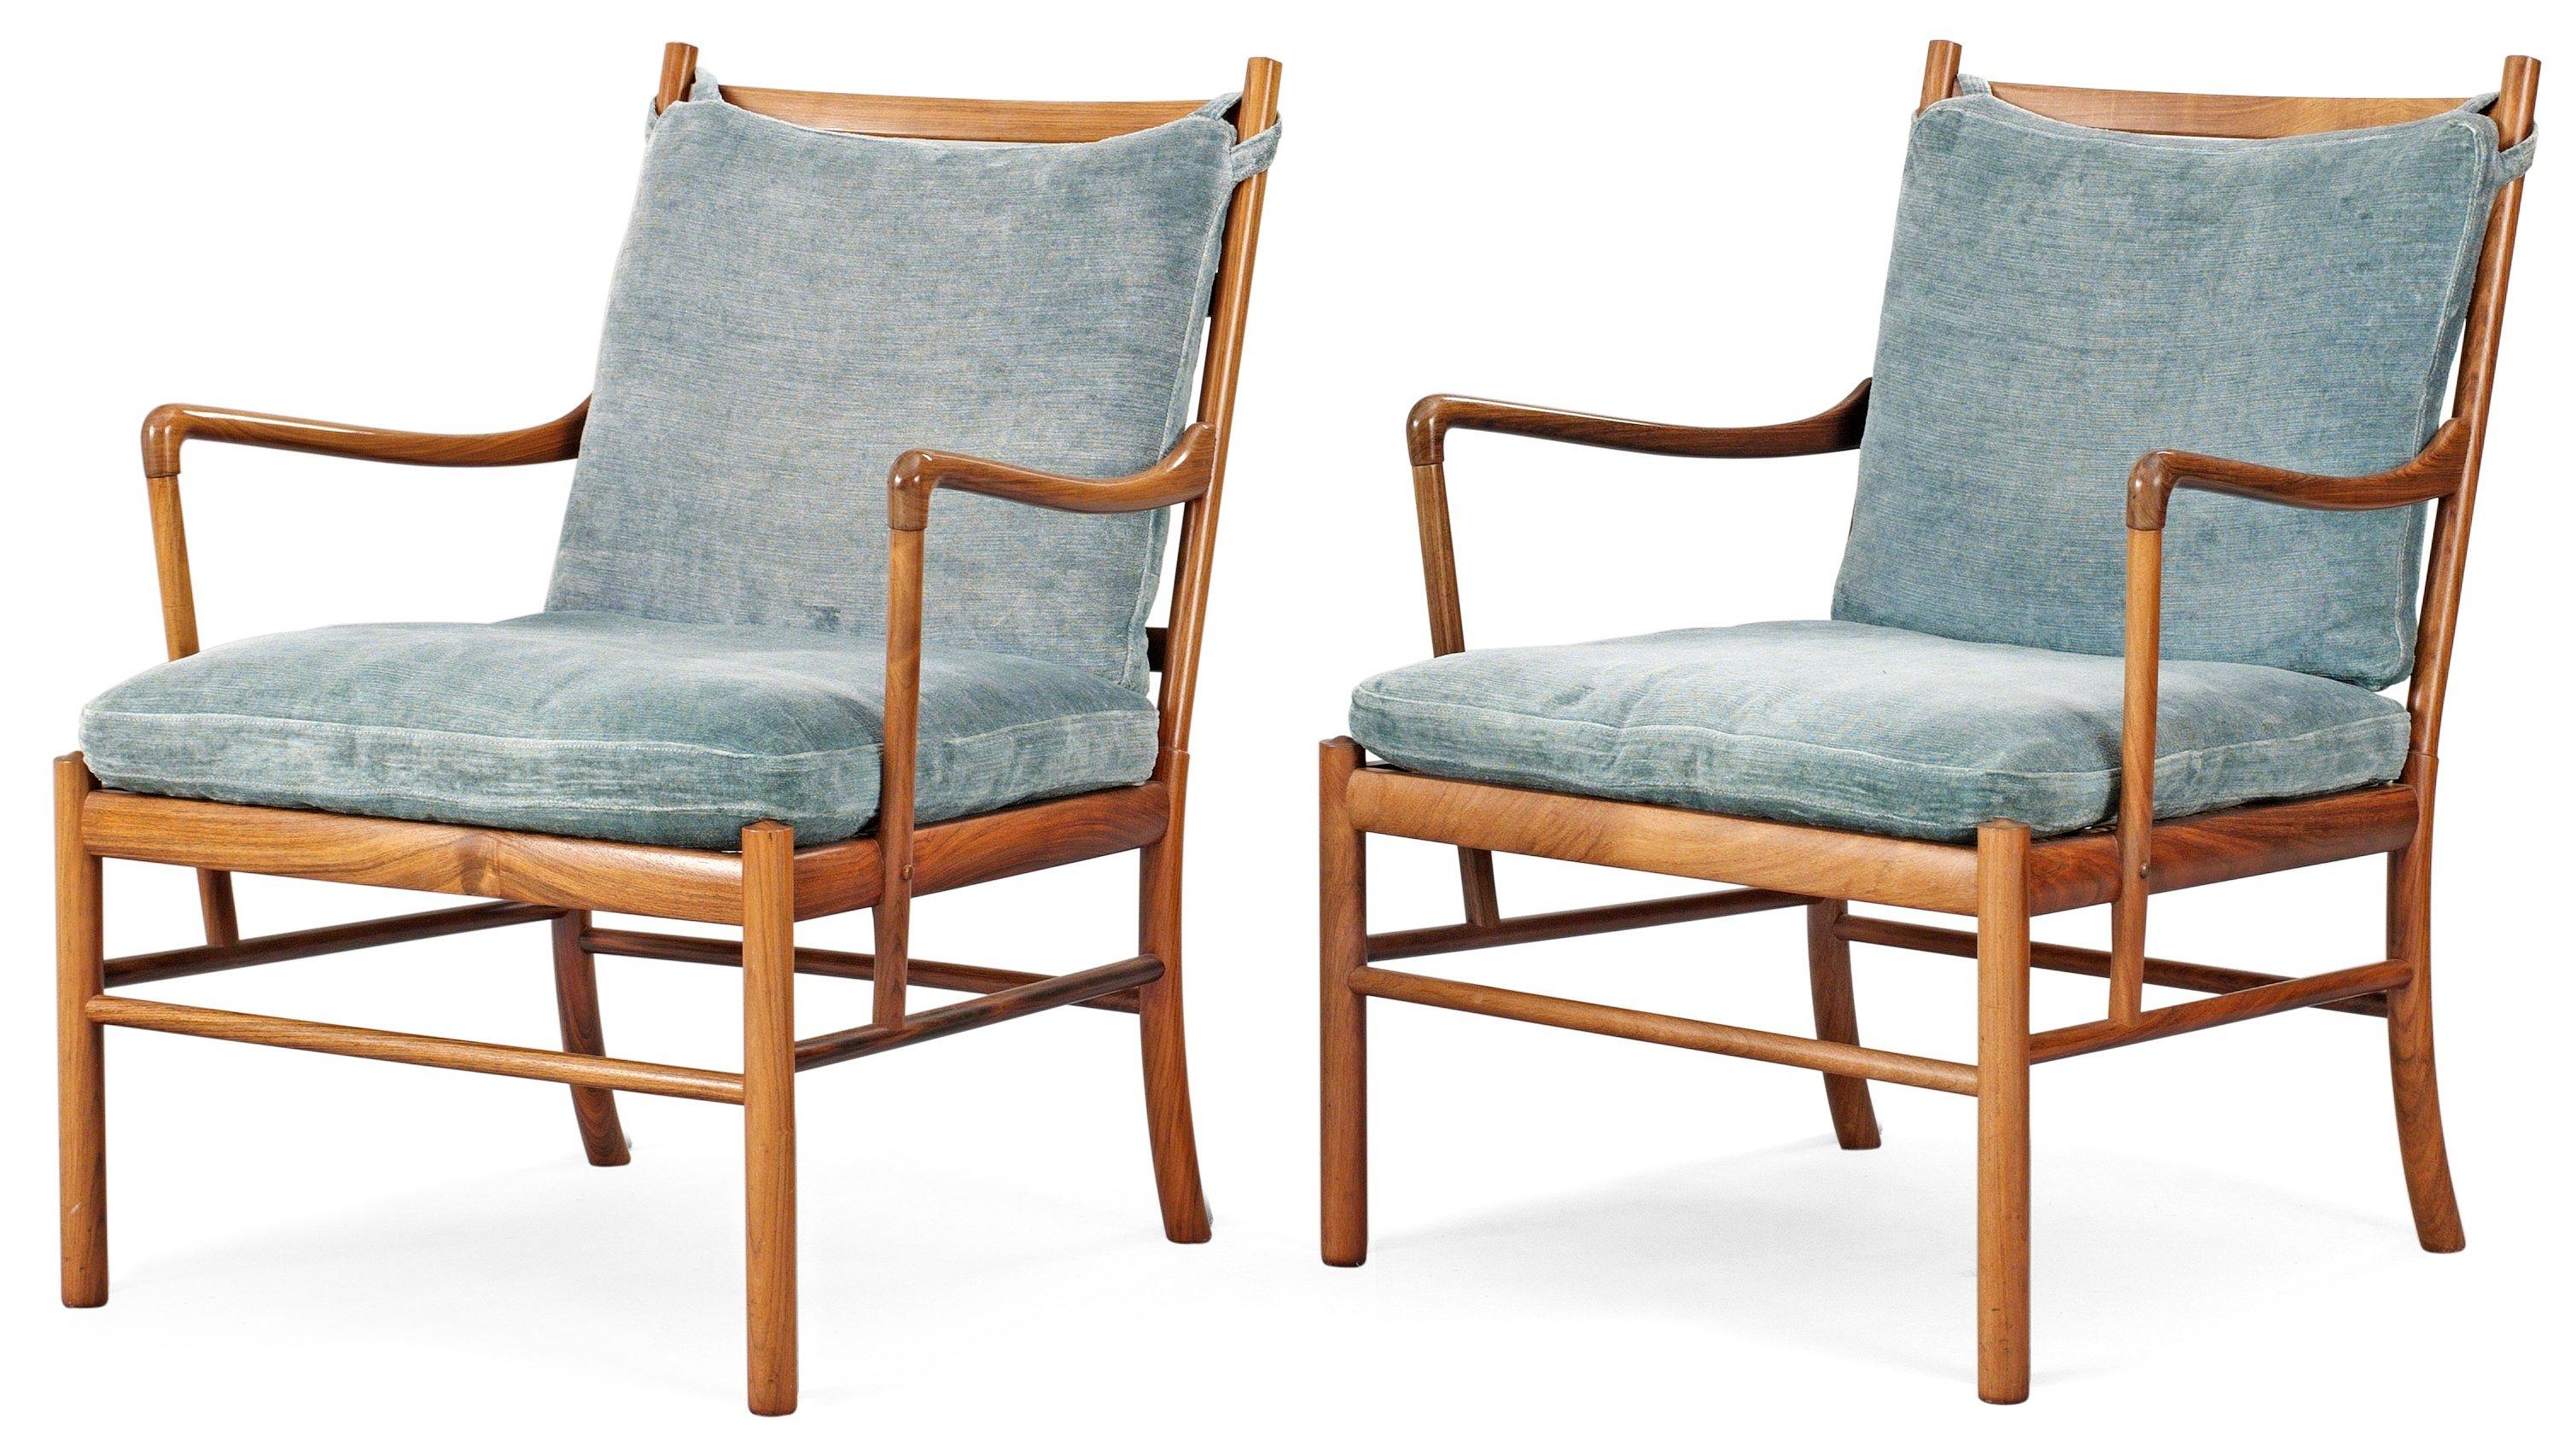 "OLE WANSCHER Karmstolar, 1 par""Colonial Chair, PJ 149"", Poul Jeppesen, Danmark Bukowskis"